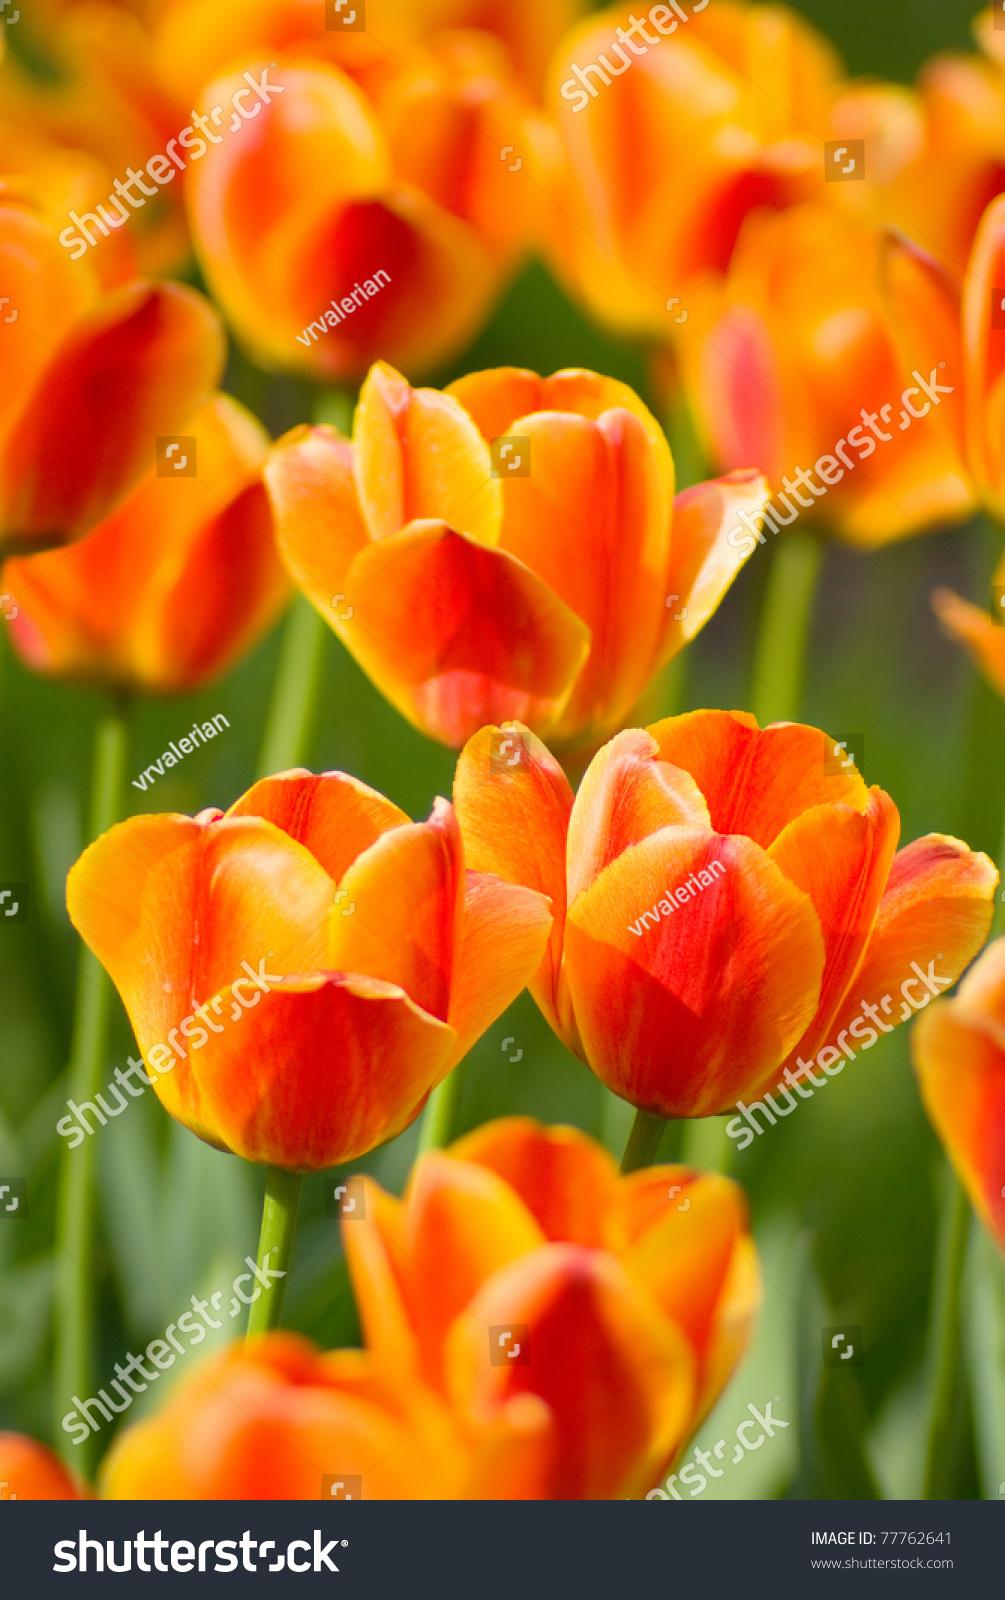 Red Orange Yellow Tulips Flower Shot Stock Photo Royalty Free